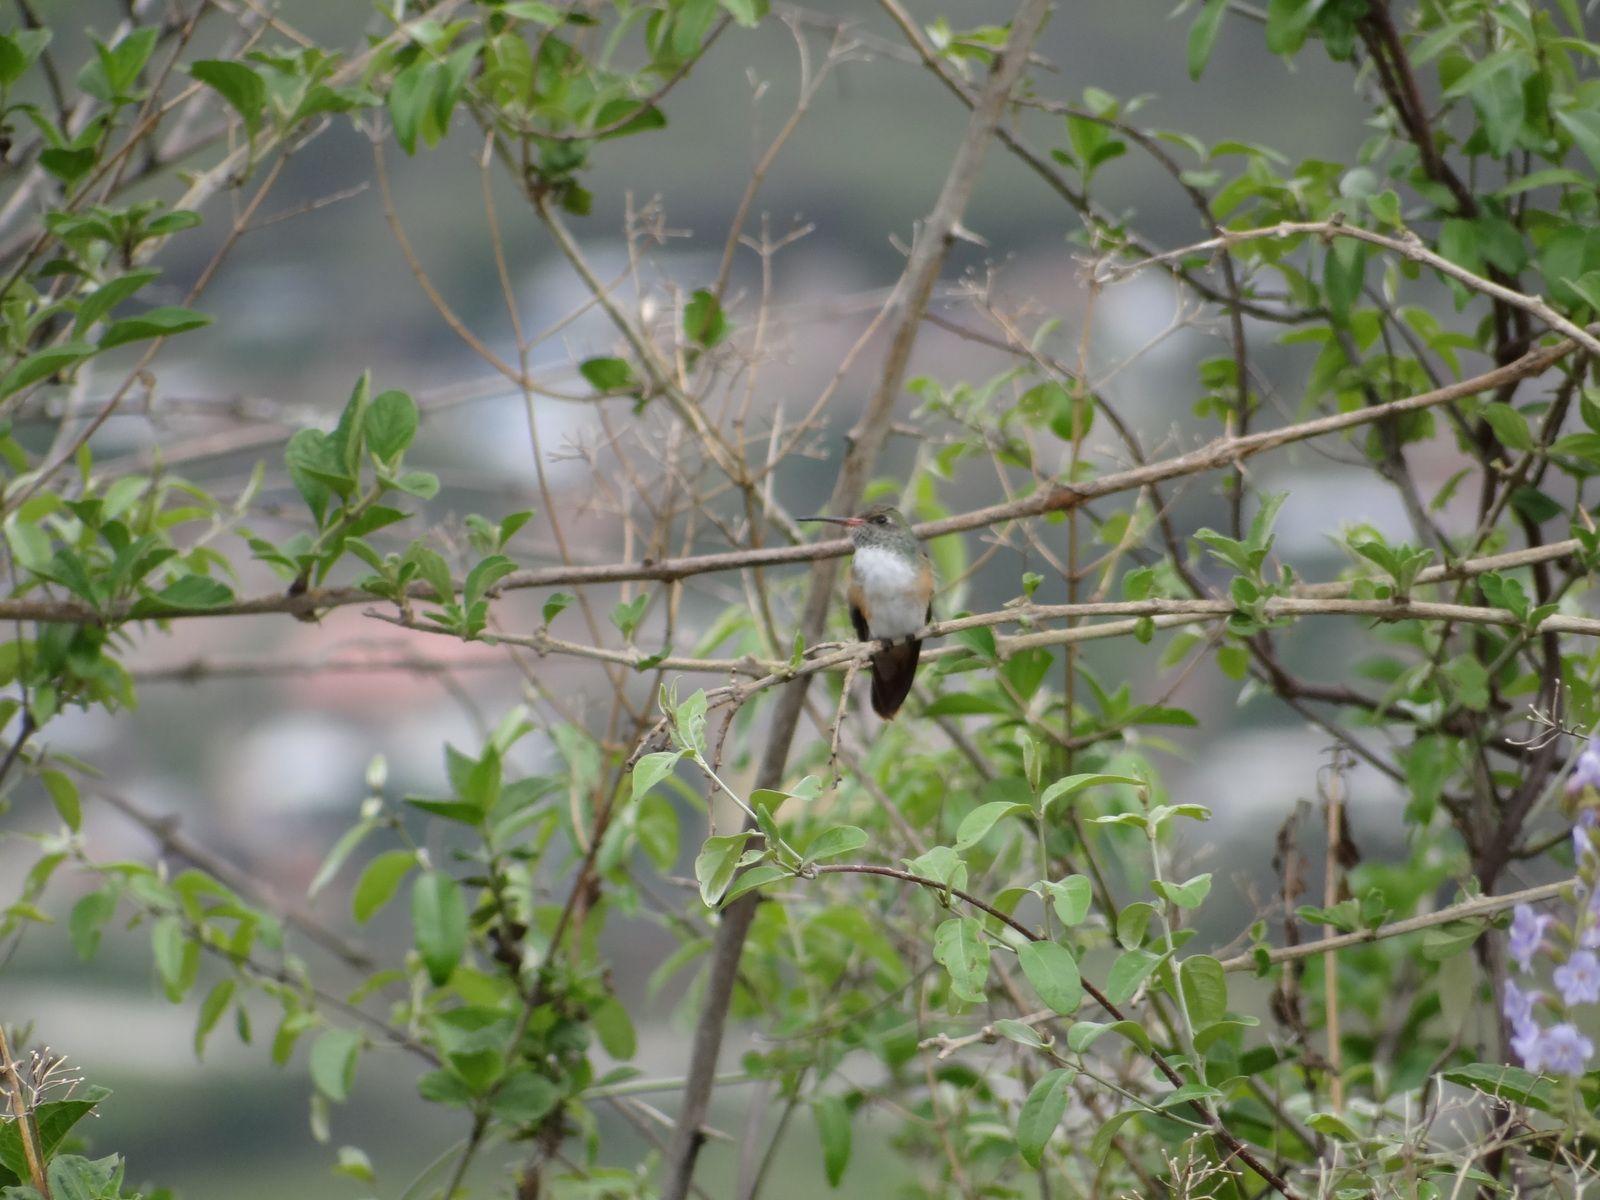 Voyage en Equateur 2014. Cuenca. Parc National Cajas. Zamora. Parc Podocarpus. Loja. Vilcabamba